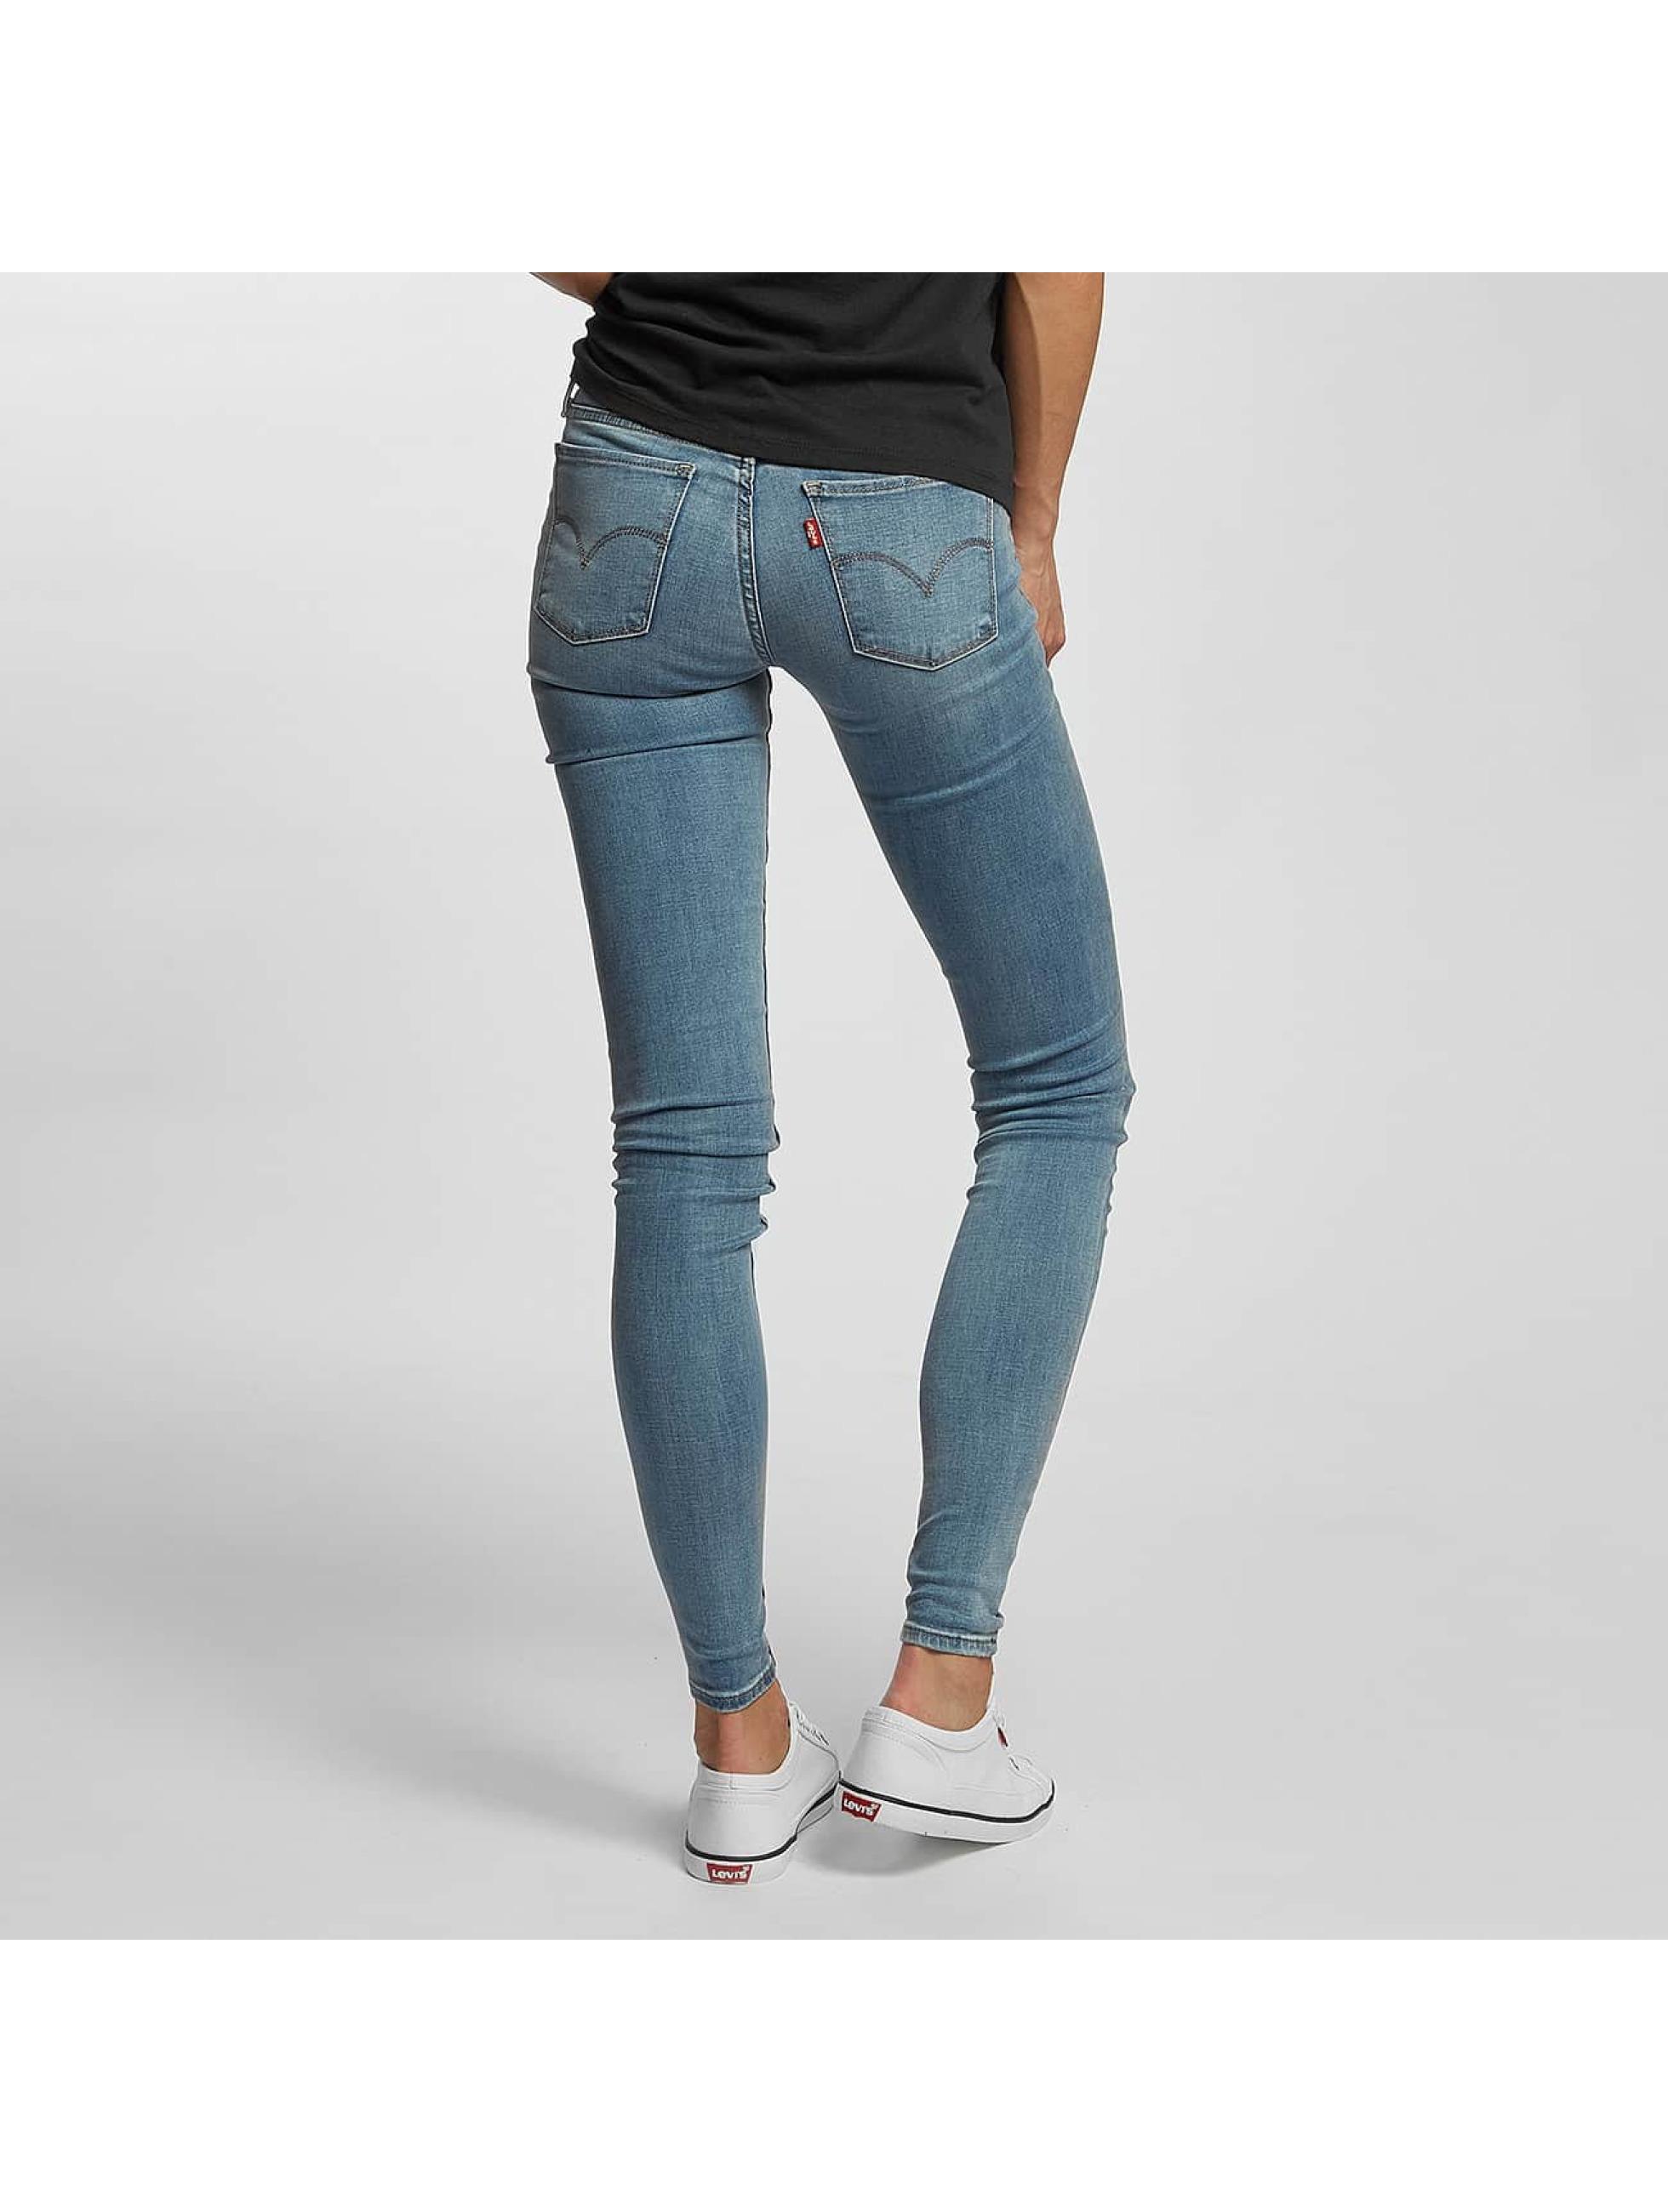 Levi's® Skinny Jeans Innovation 710 Super blue